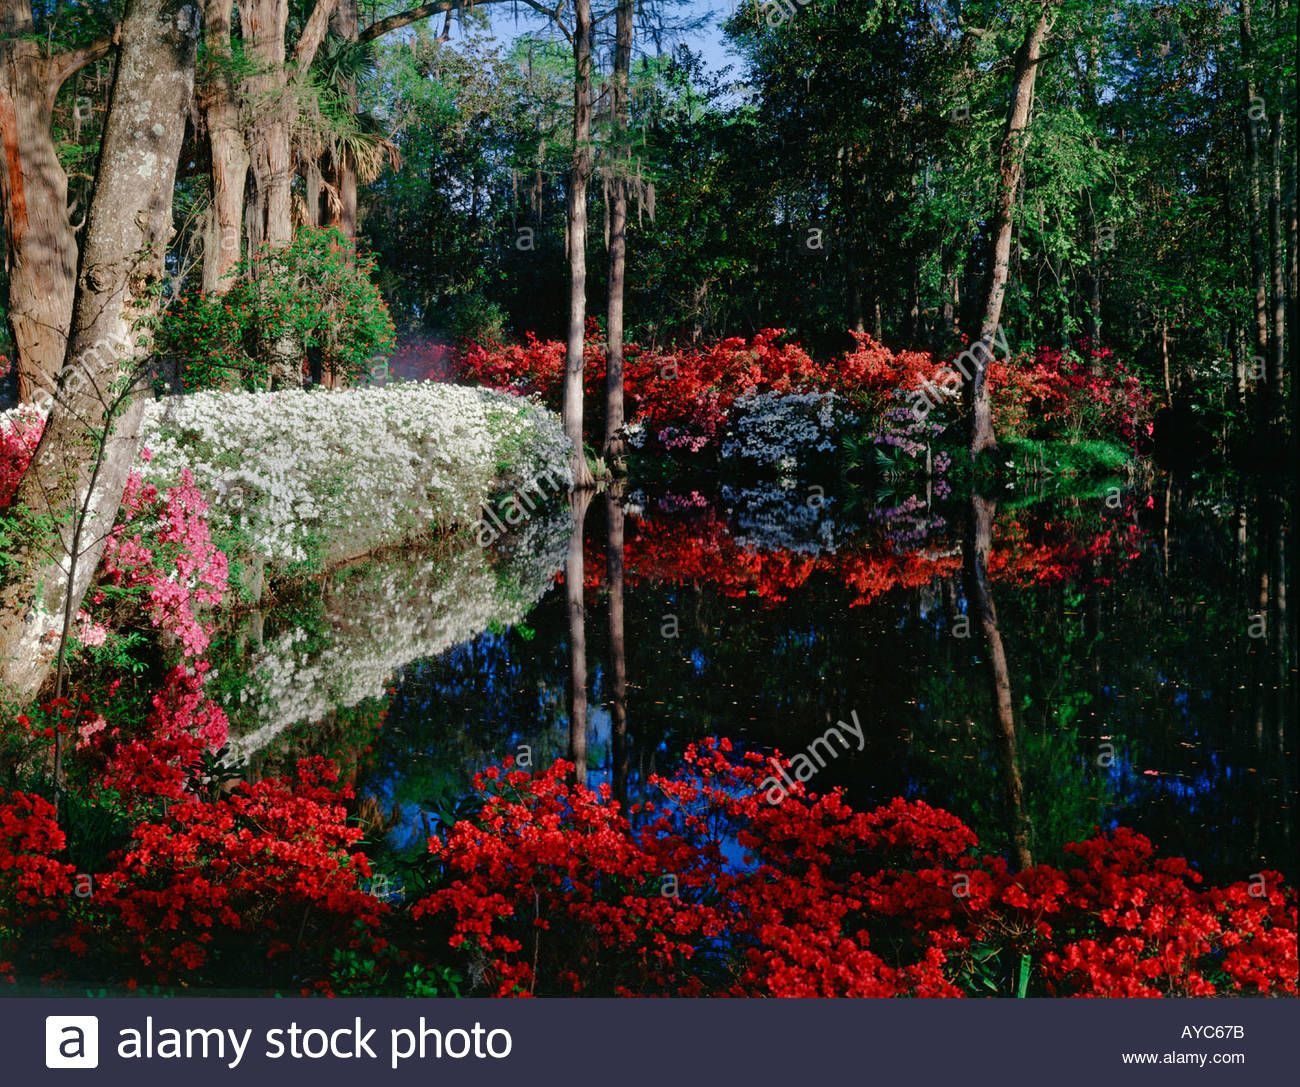 Magnolia Gardens near Charleston in South Carolina with